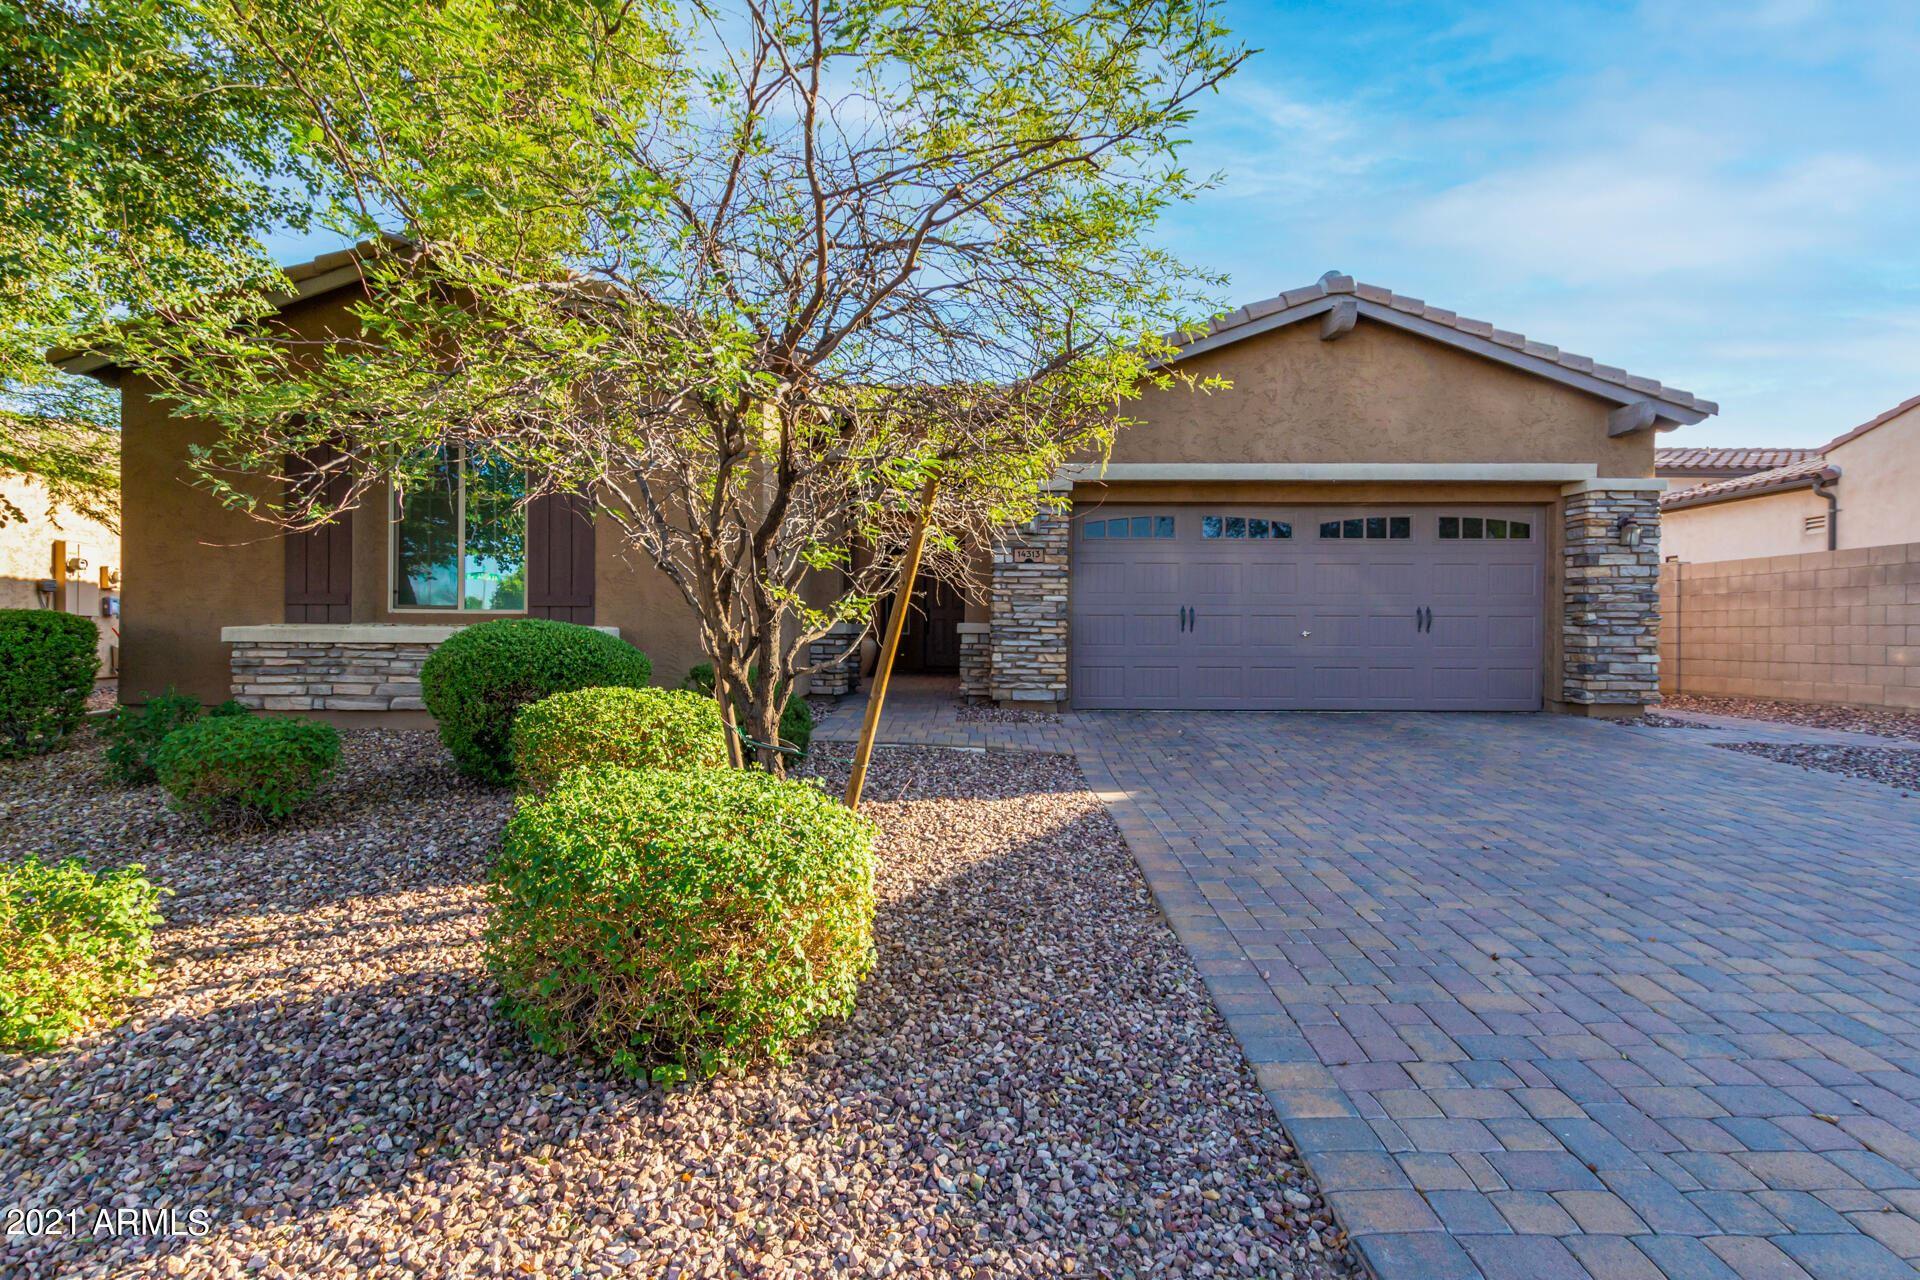 Photo of 14313 W ALMERIA Road, Goodyear, AZ 85395 (MLS # 6295752)